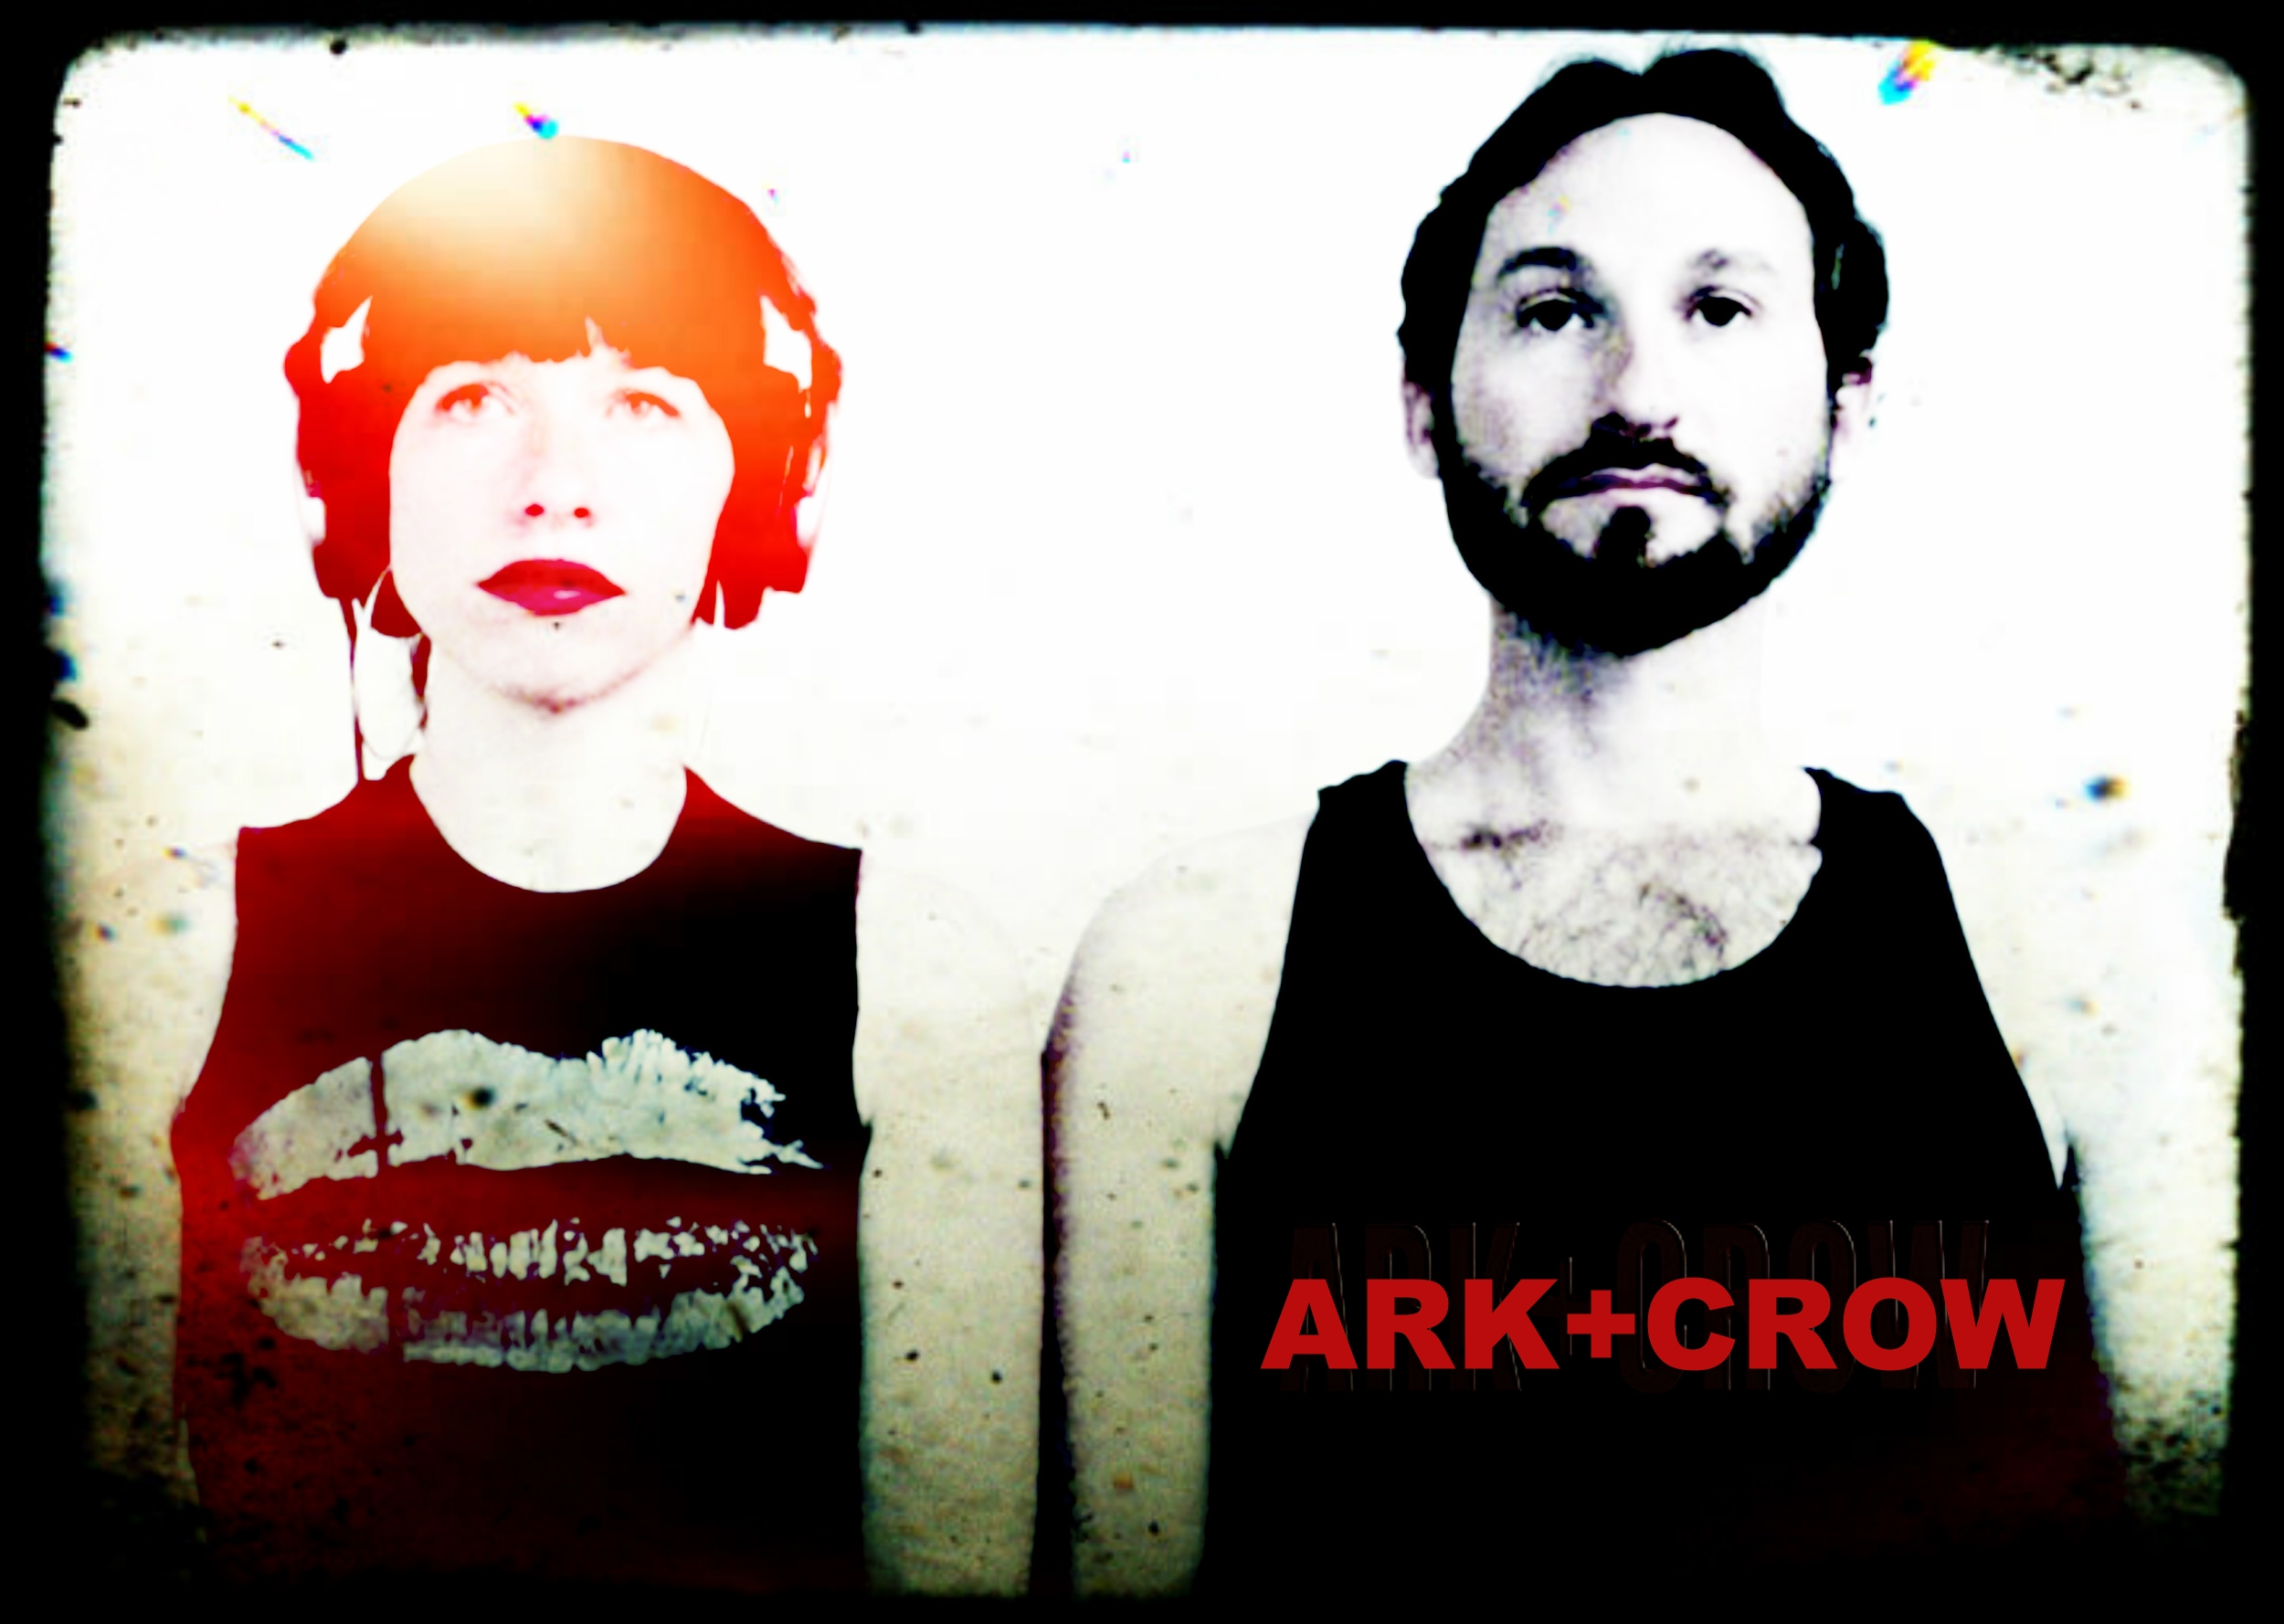 ARK+CROW Press Photo 2.jpg